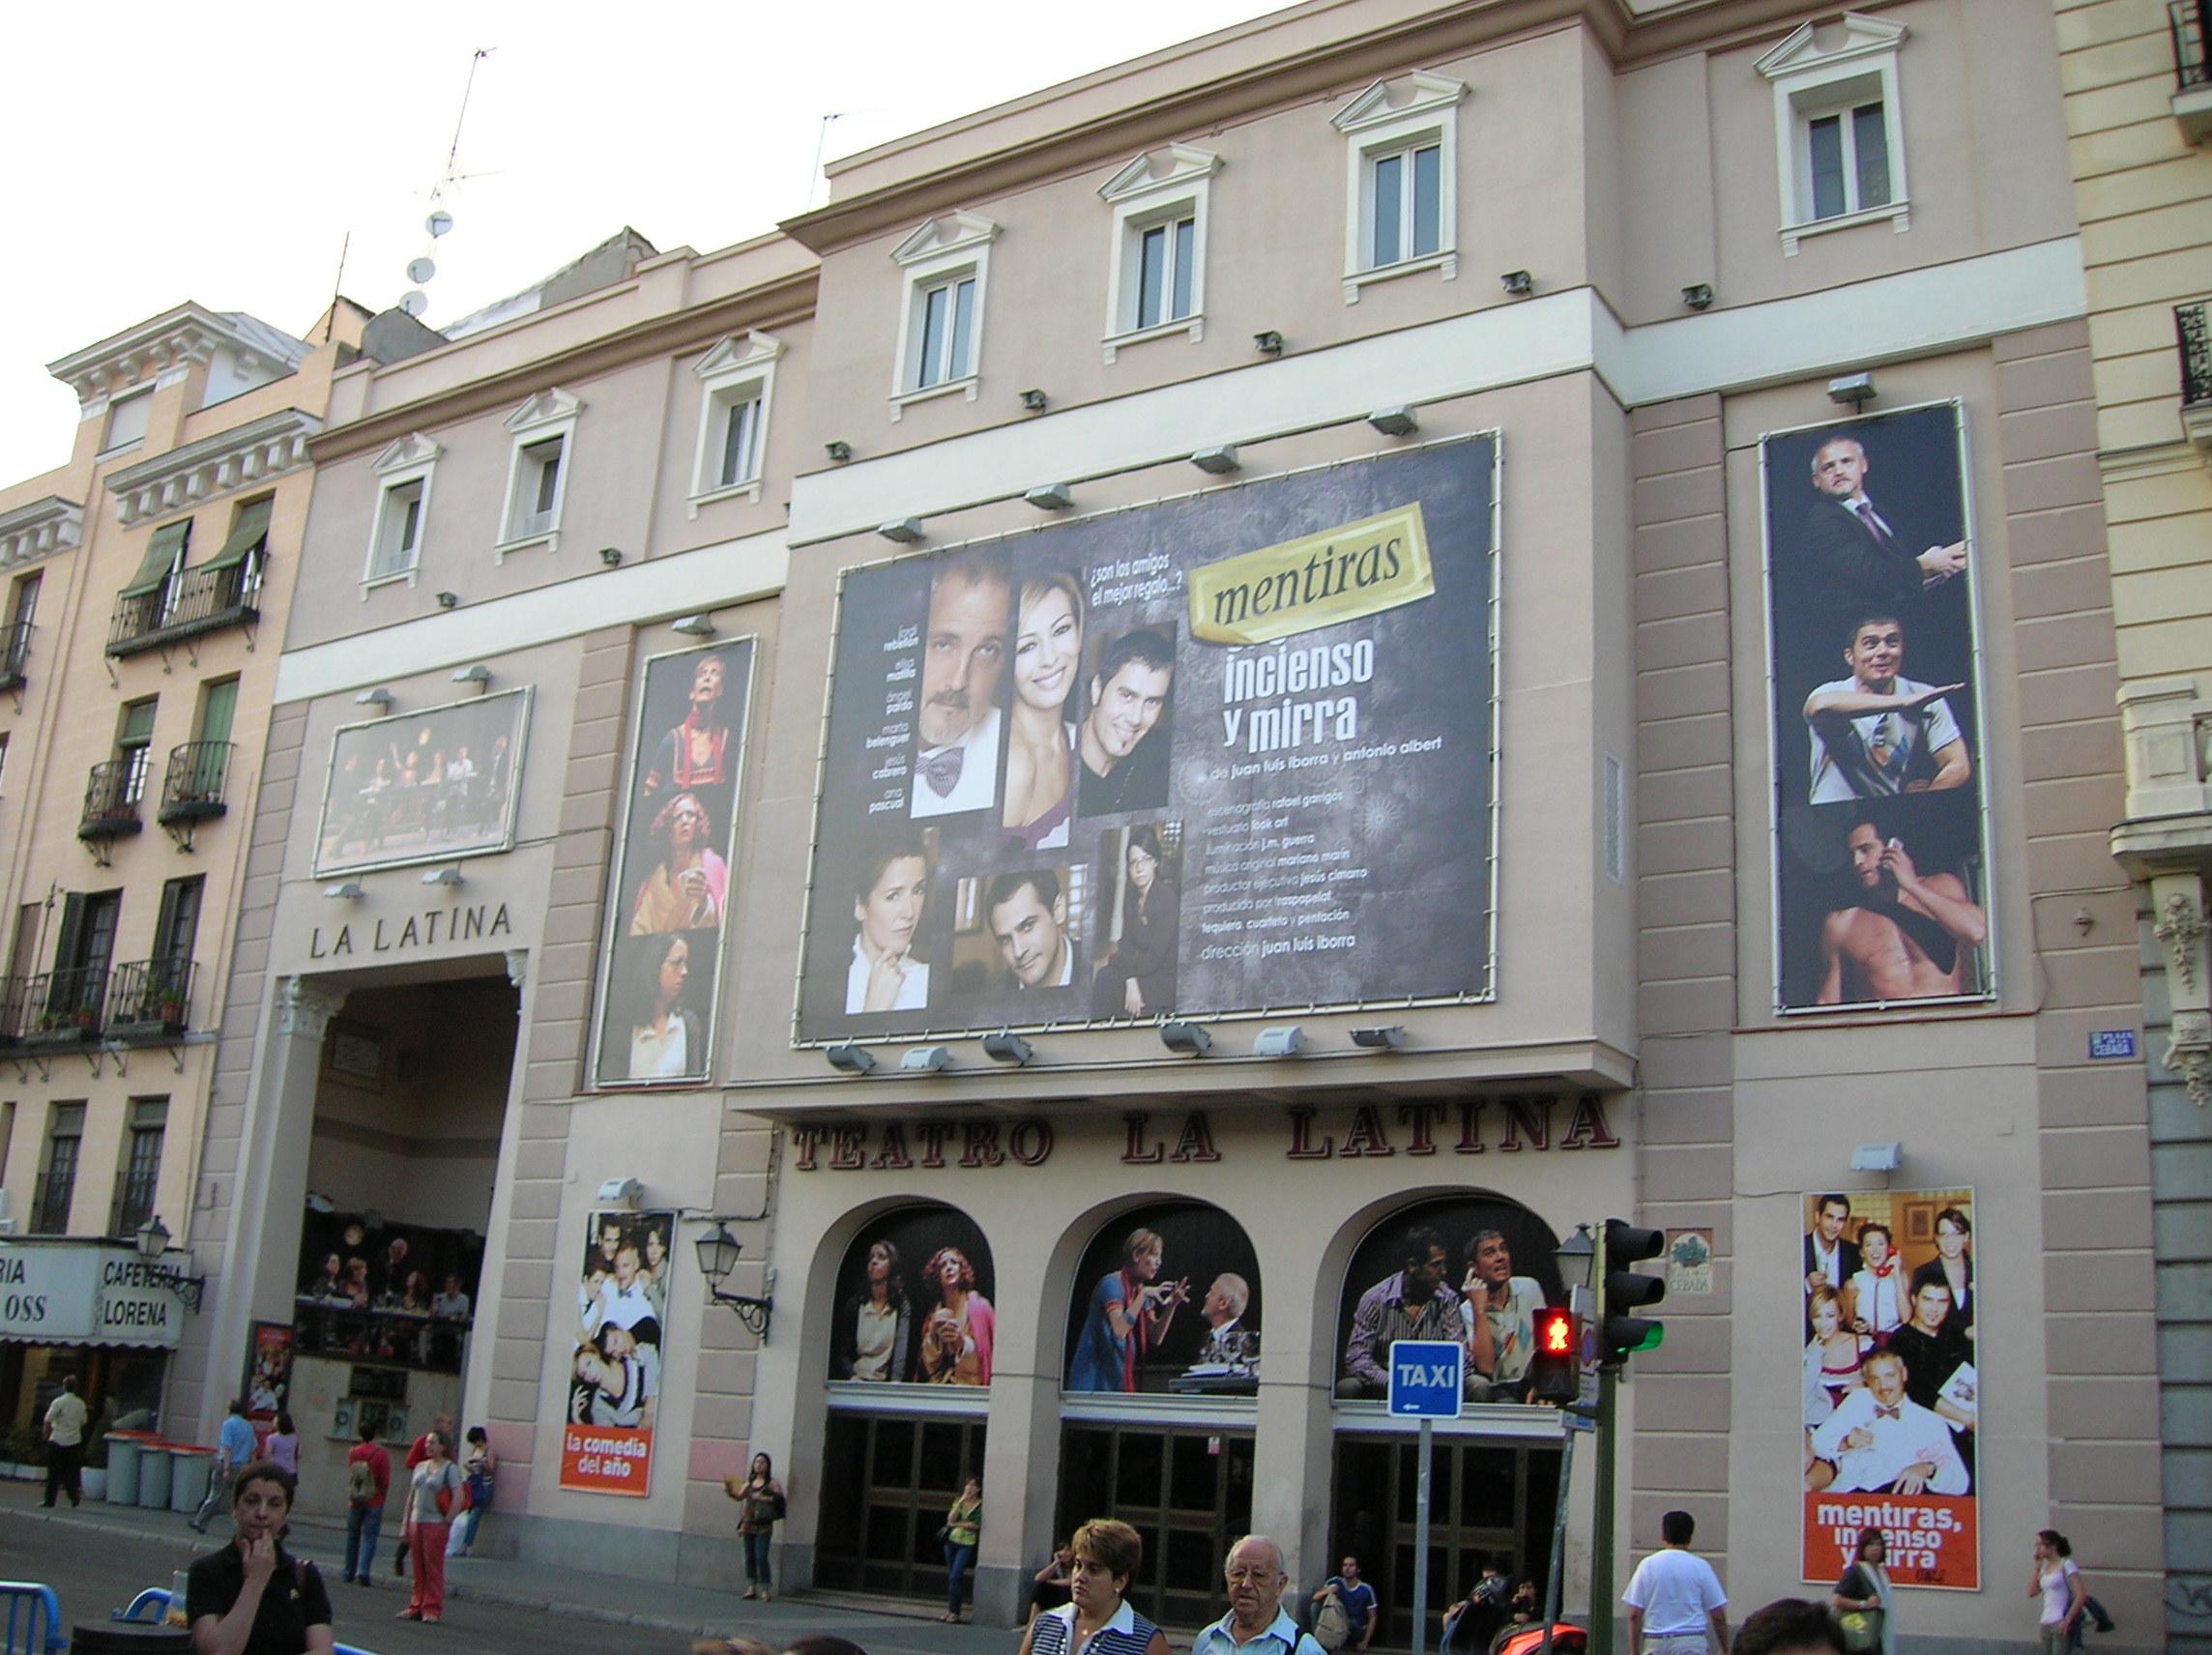 Depiction of Teatro La Latina